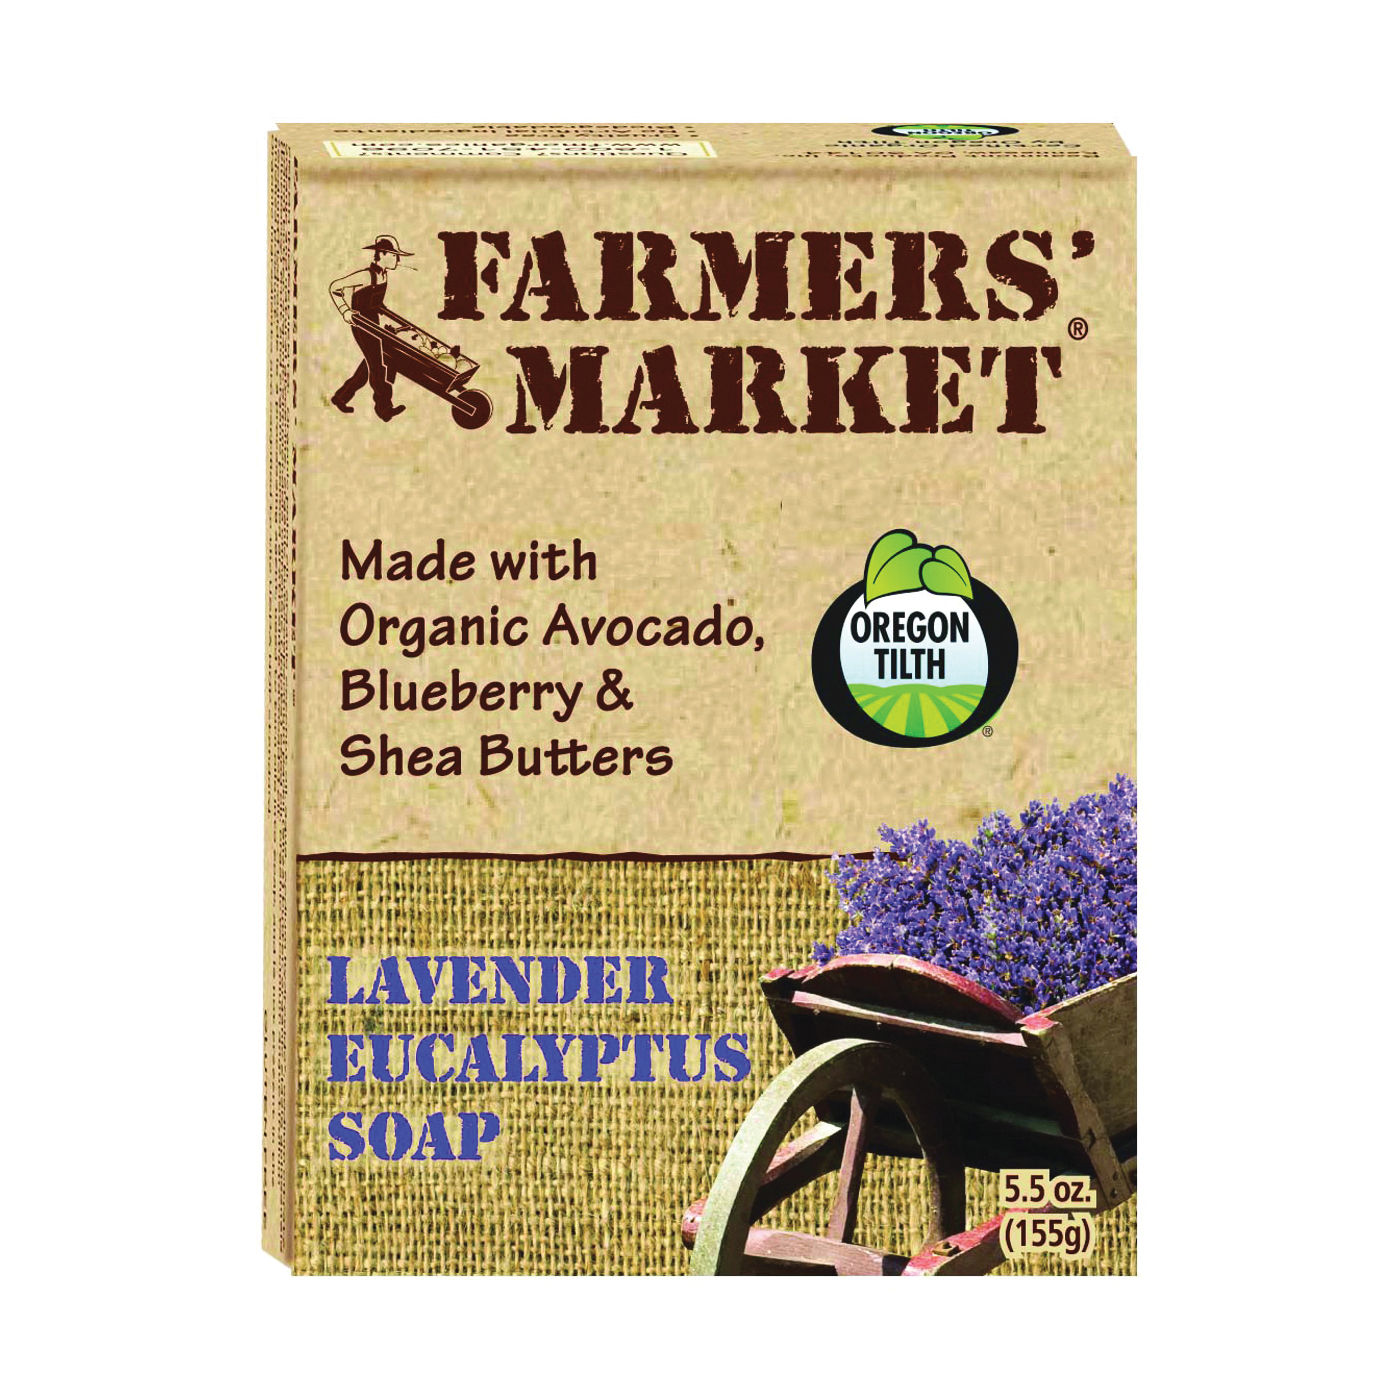 Picture of FARMERS' MARKET 946872081-12PK Bar Soap, Eucalyptus, Lavender, 5.5 oz Package